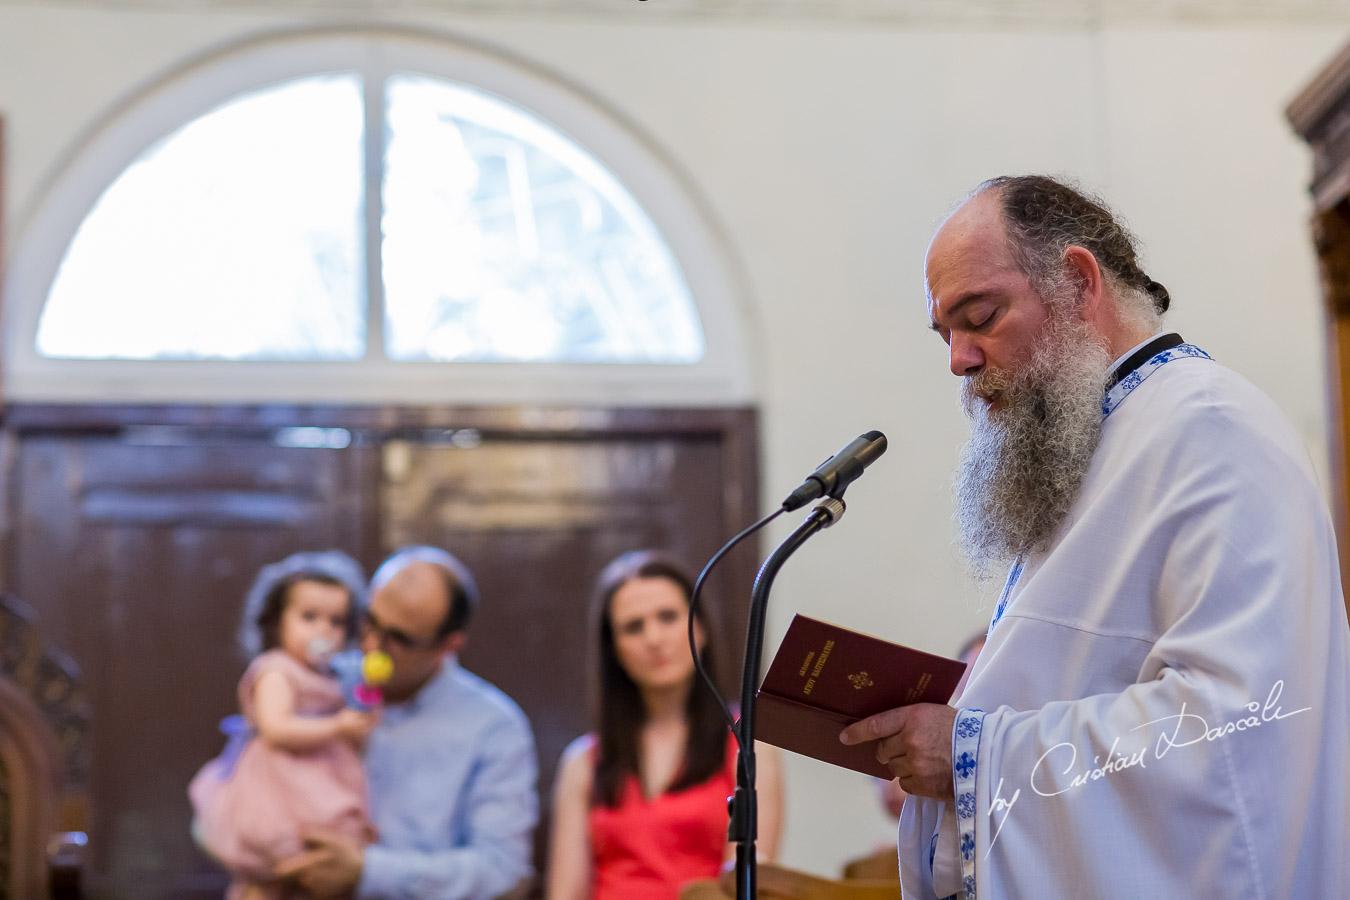 Baptism Photograher in Nicosia - Chrisanti's Christening by Cristian Dascalu - 18